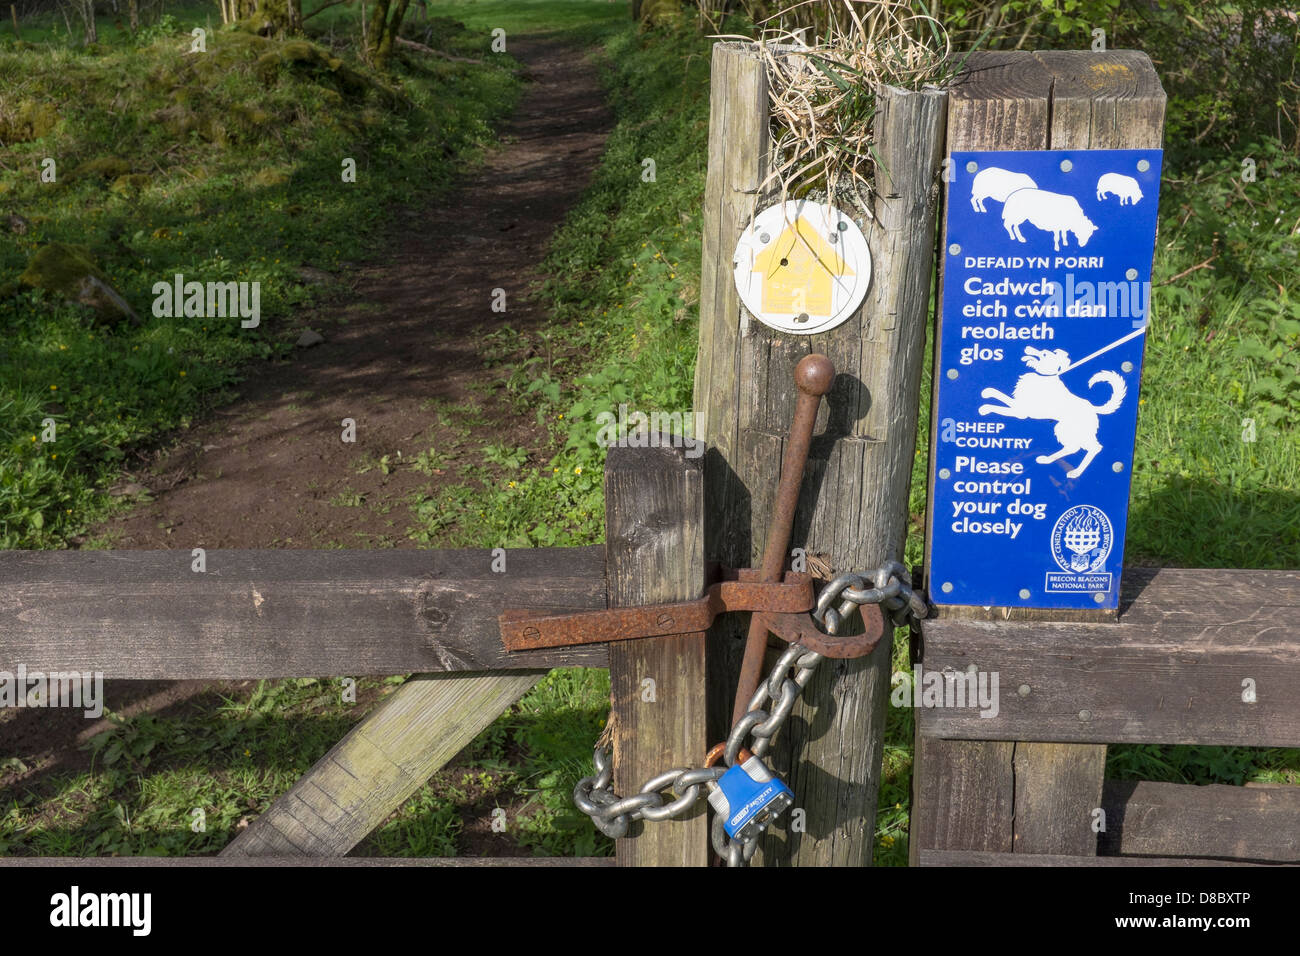 woodland path gate, bridleway. - Stock Image